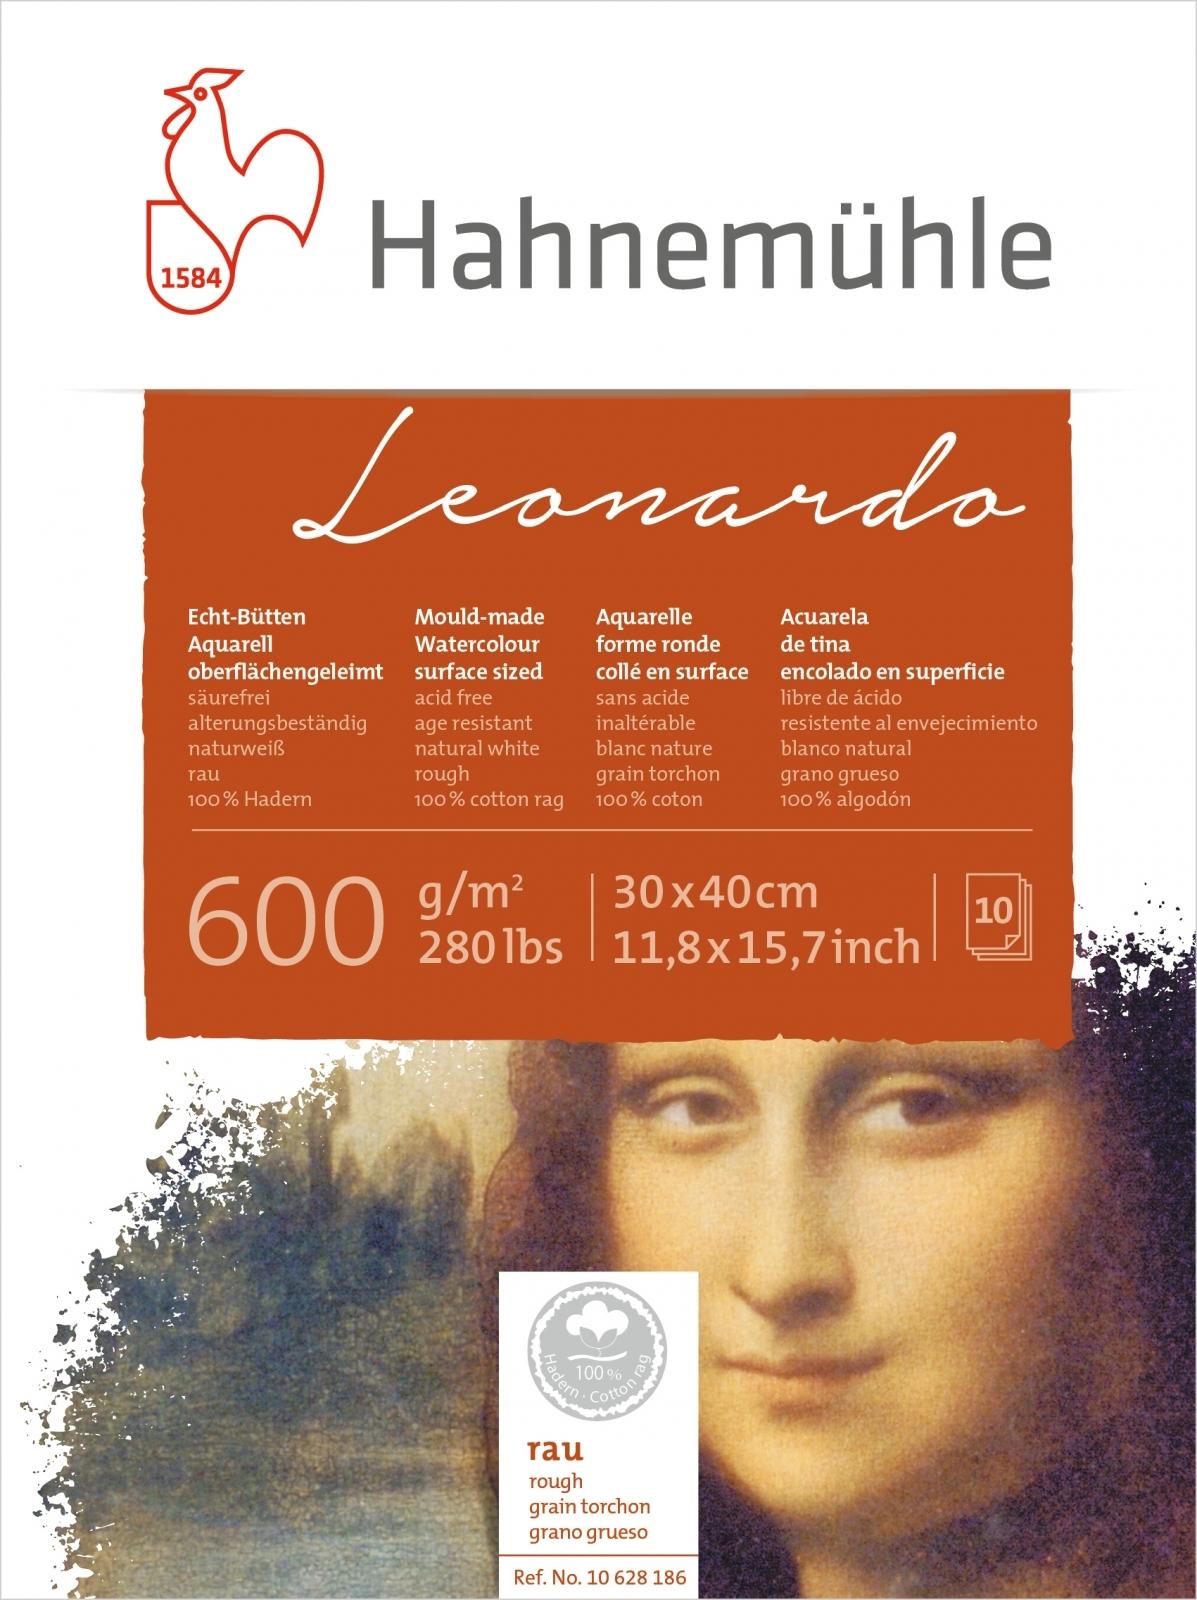 Papel Hahnemuhle Leonardo Textura Rugosa 600g/m2 30x40 10fls - Papelaria Botafogo